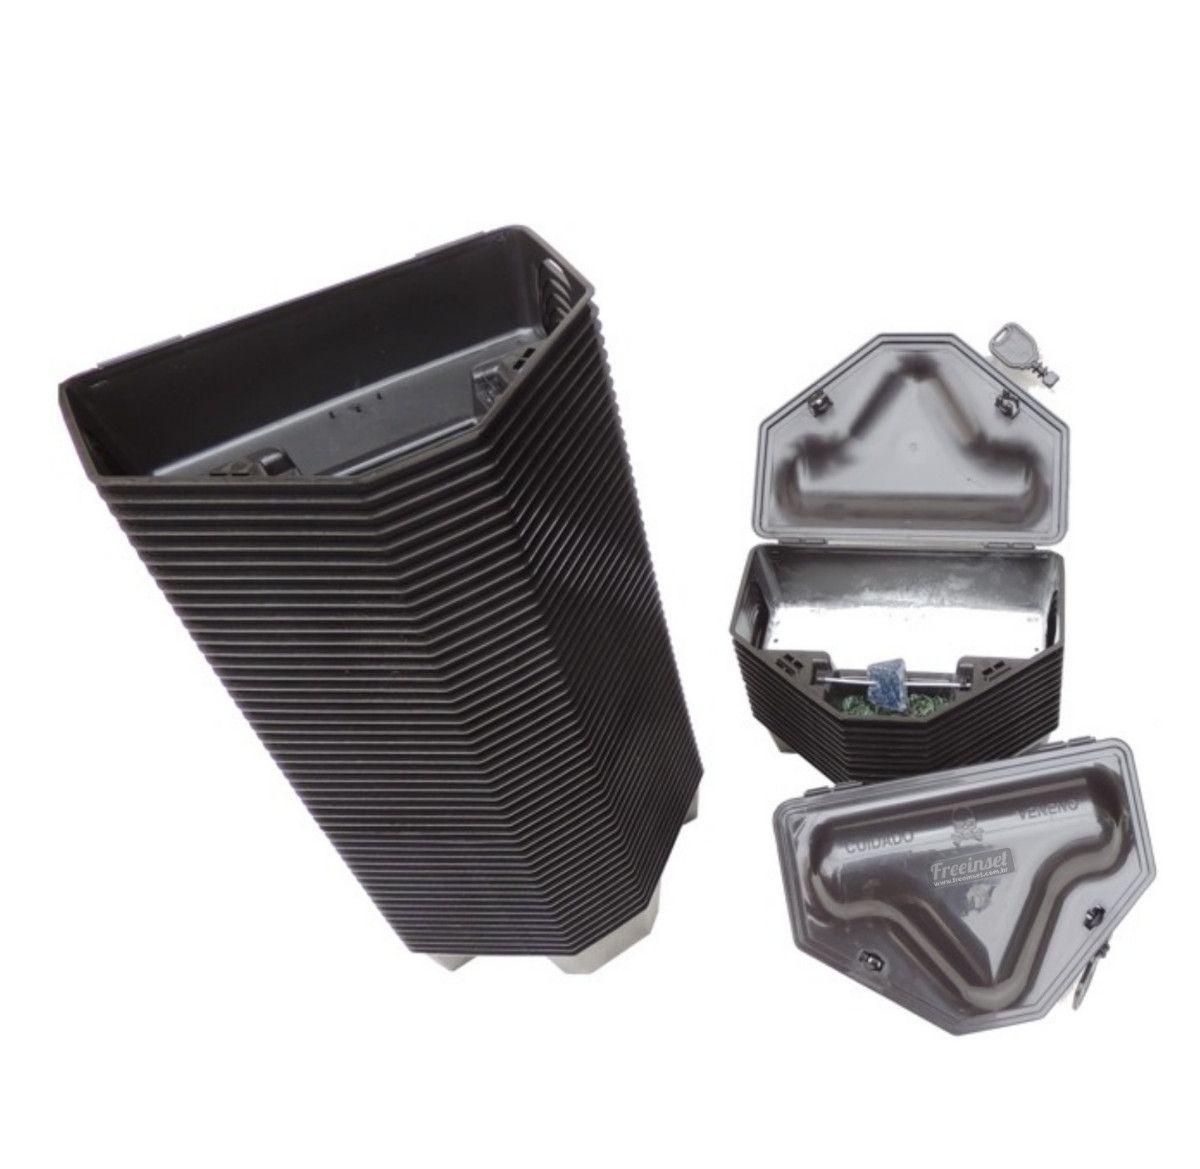 Kit 100 Porta Isca Reforçado, Com 2 Chaves - Duplo Travamento